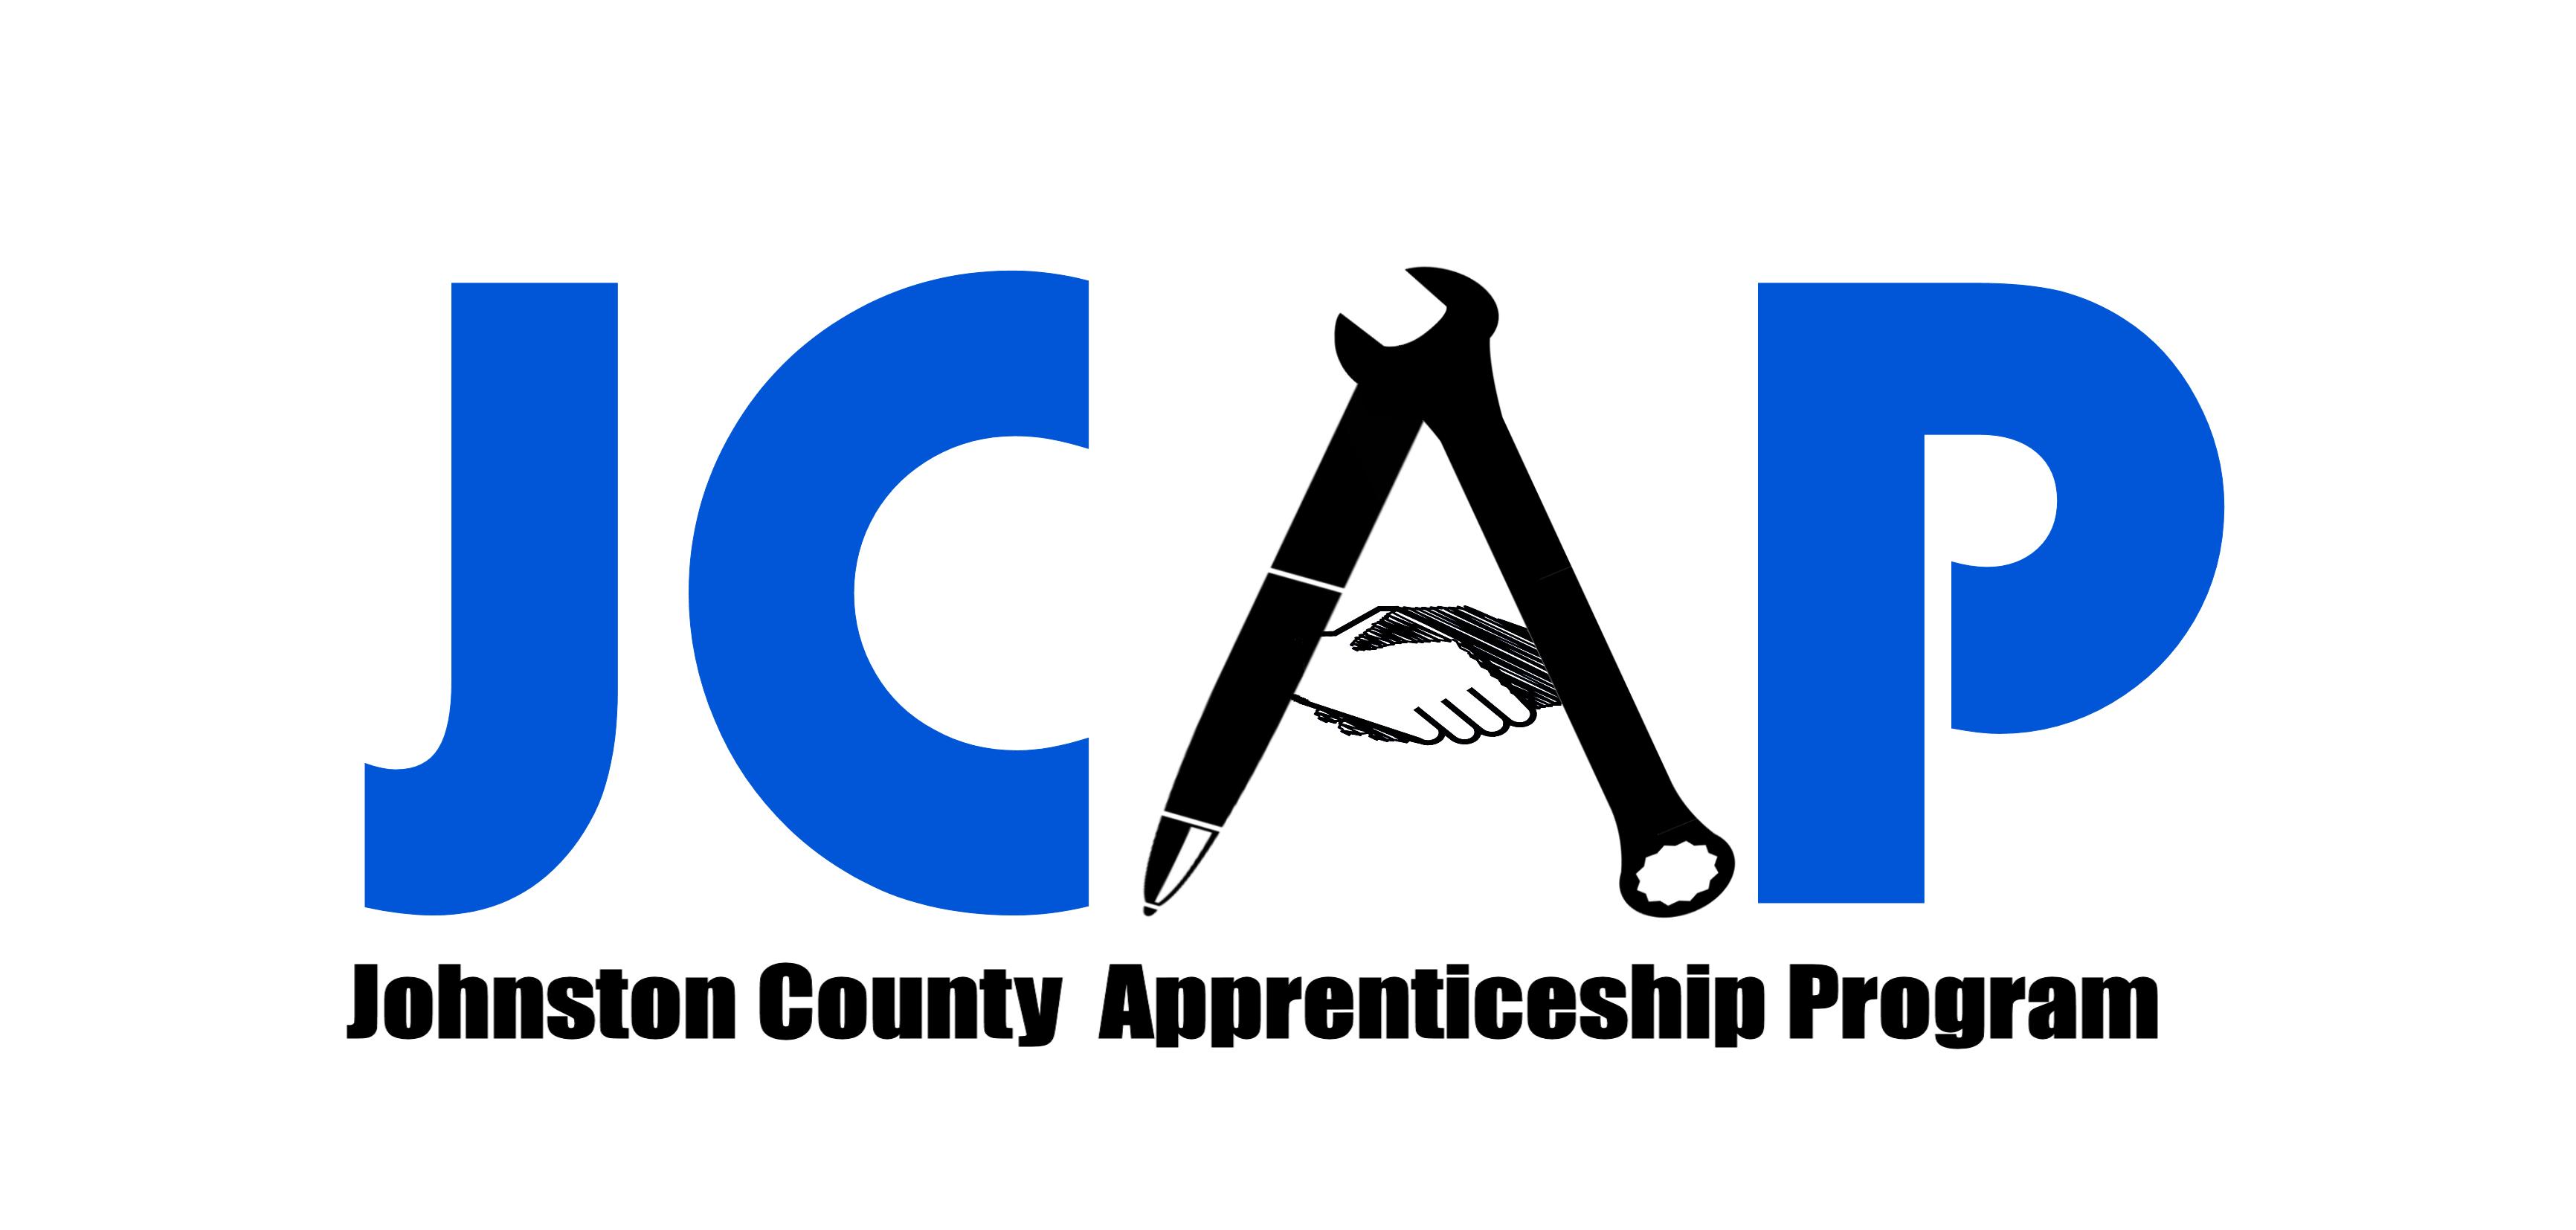 Johnston County Apprenticeship Program logo